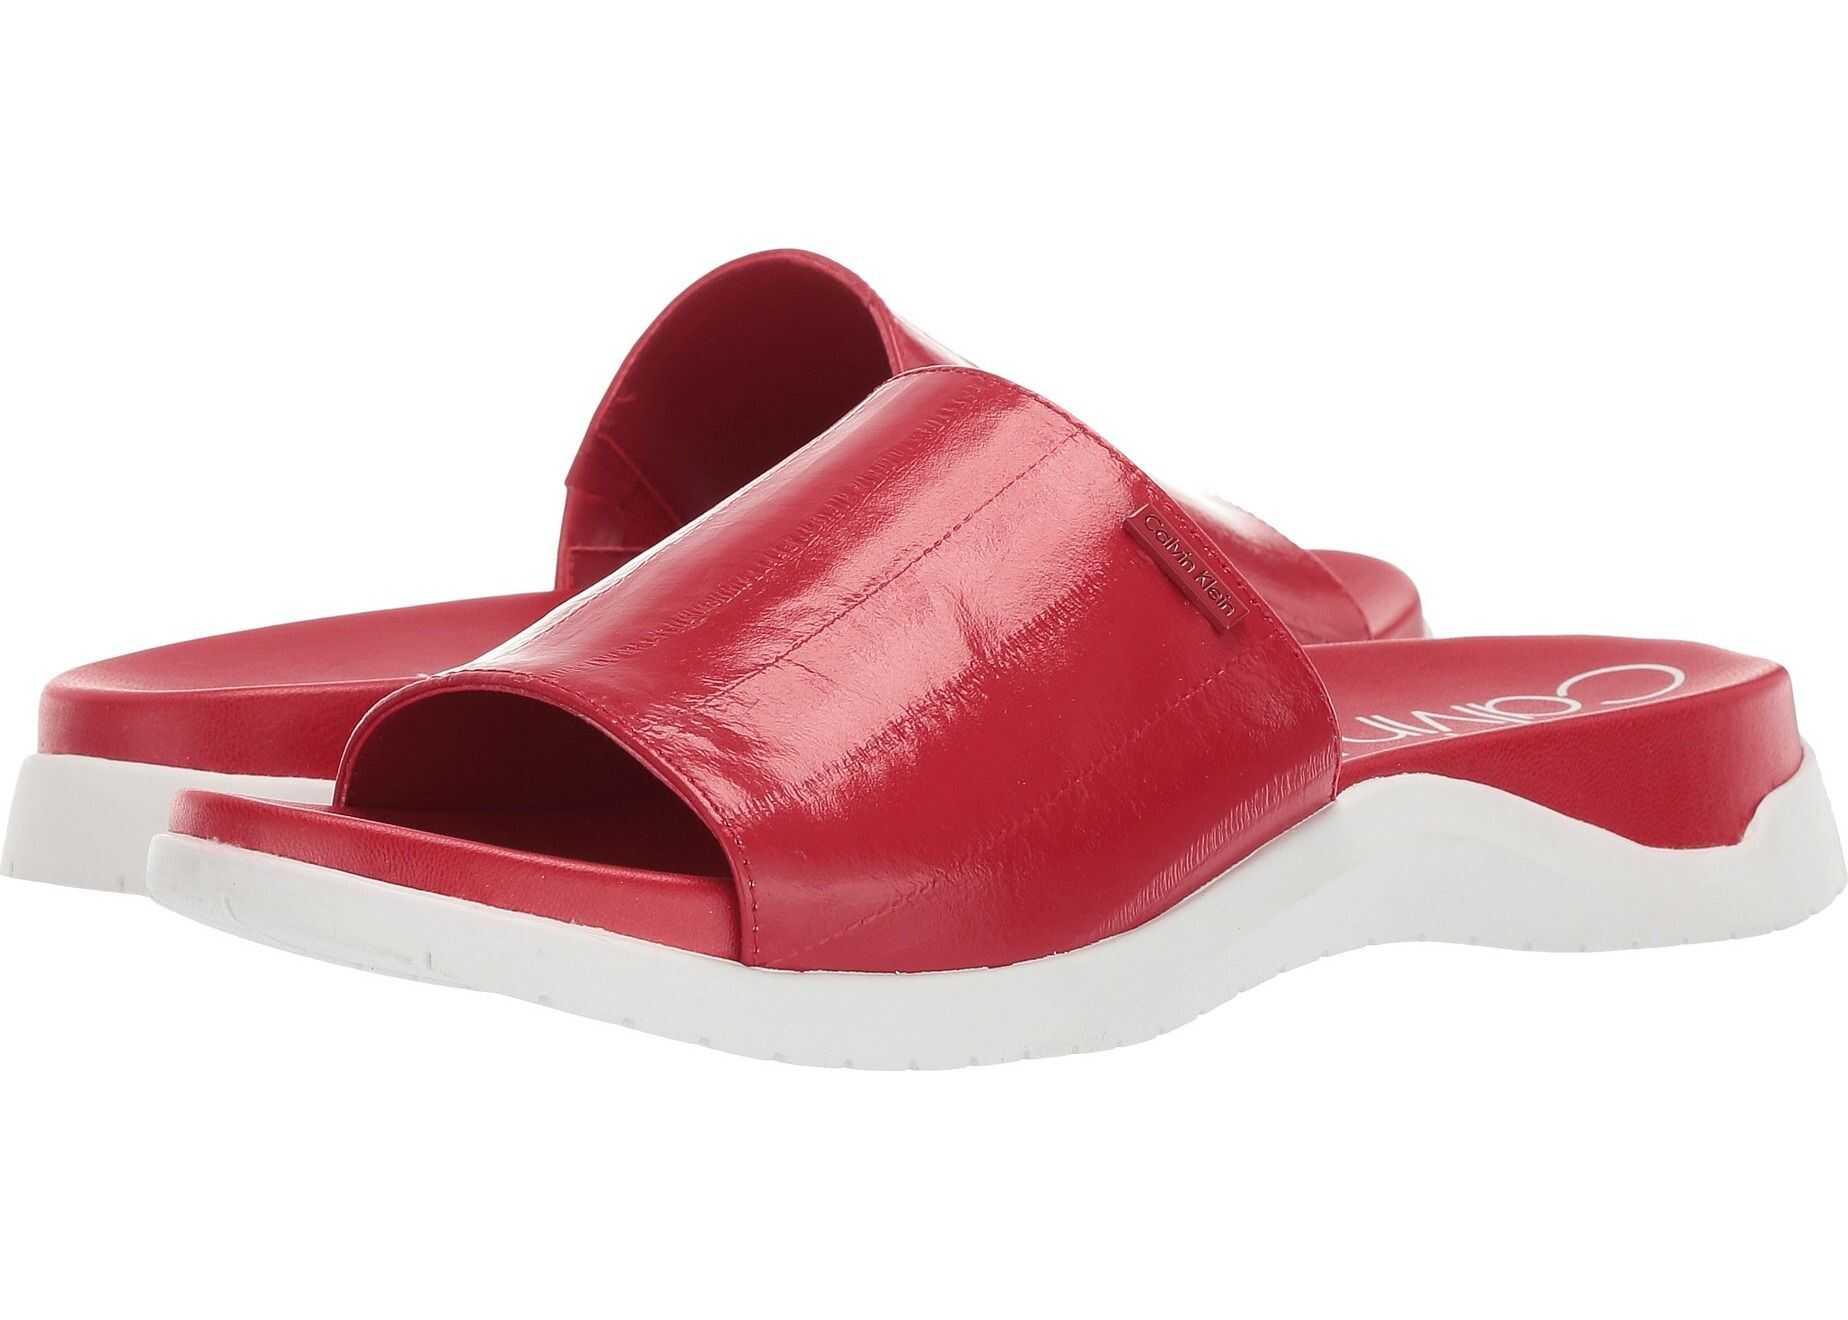 Calvin Klein Ubi Scarlet High Gloss Eel